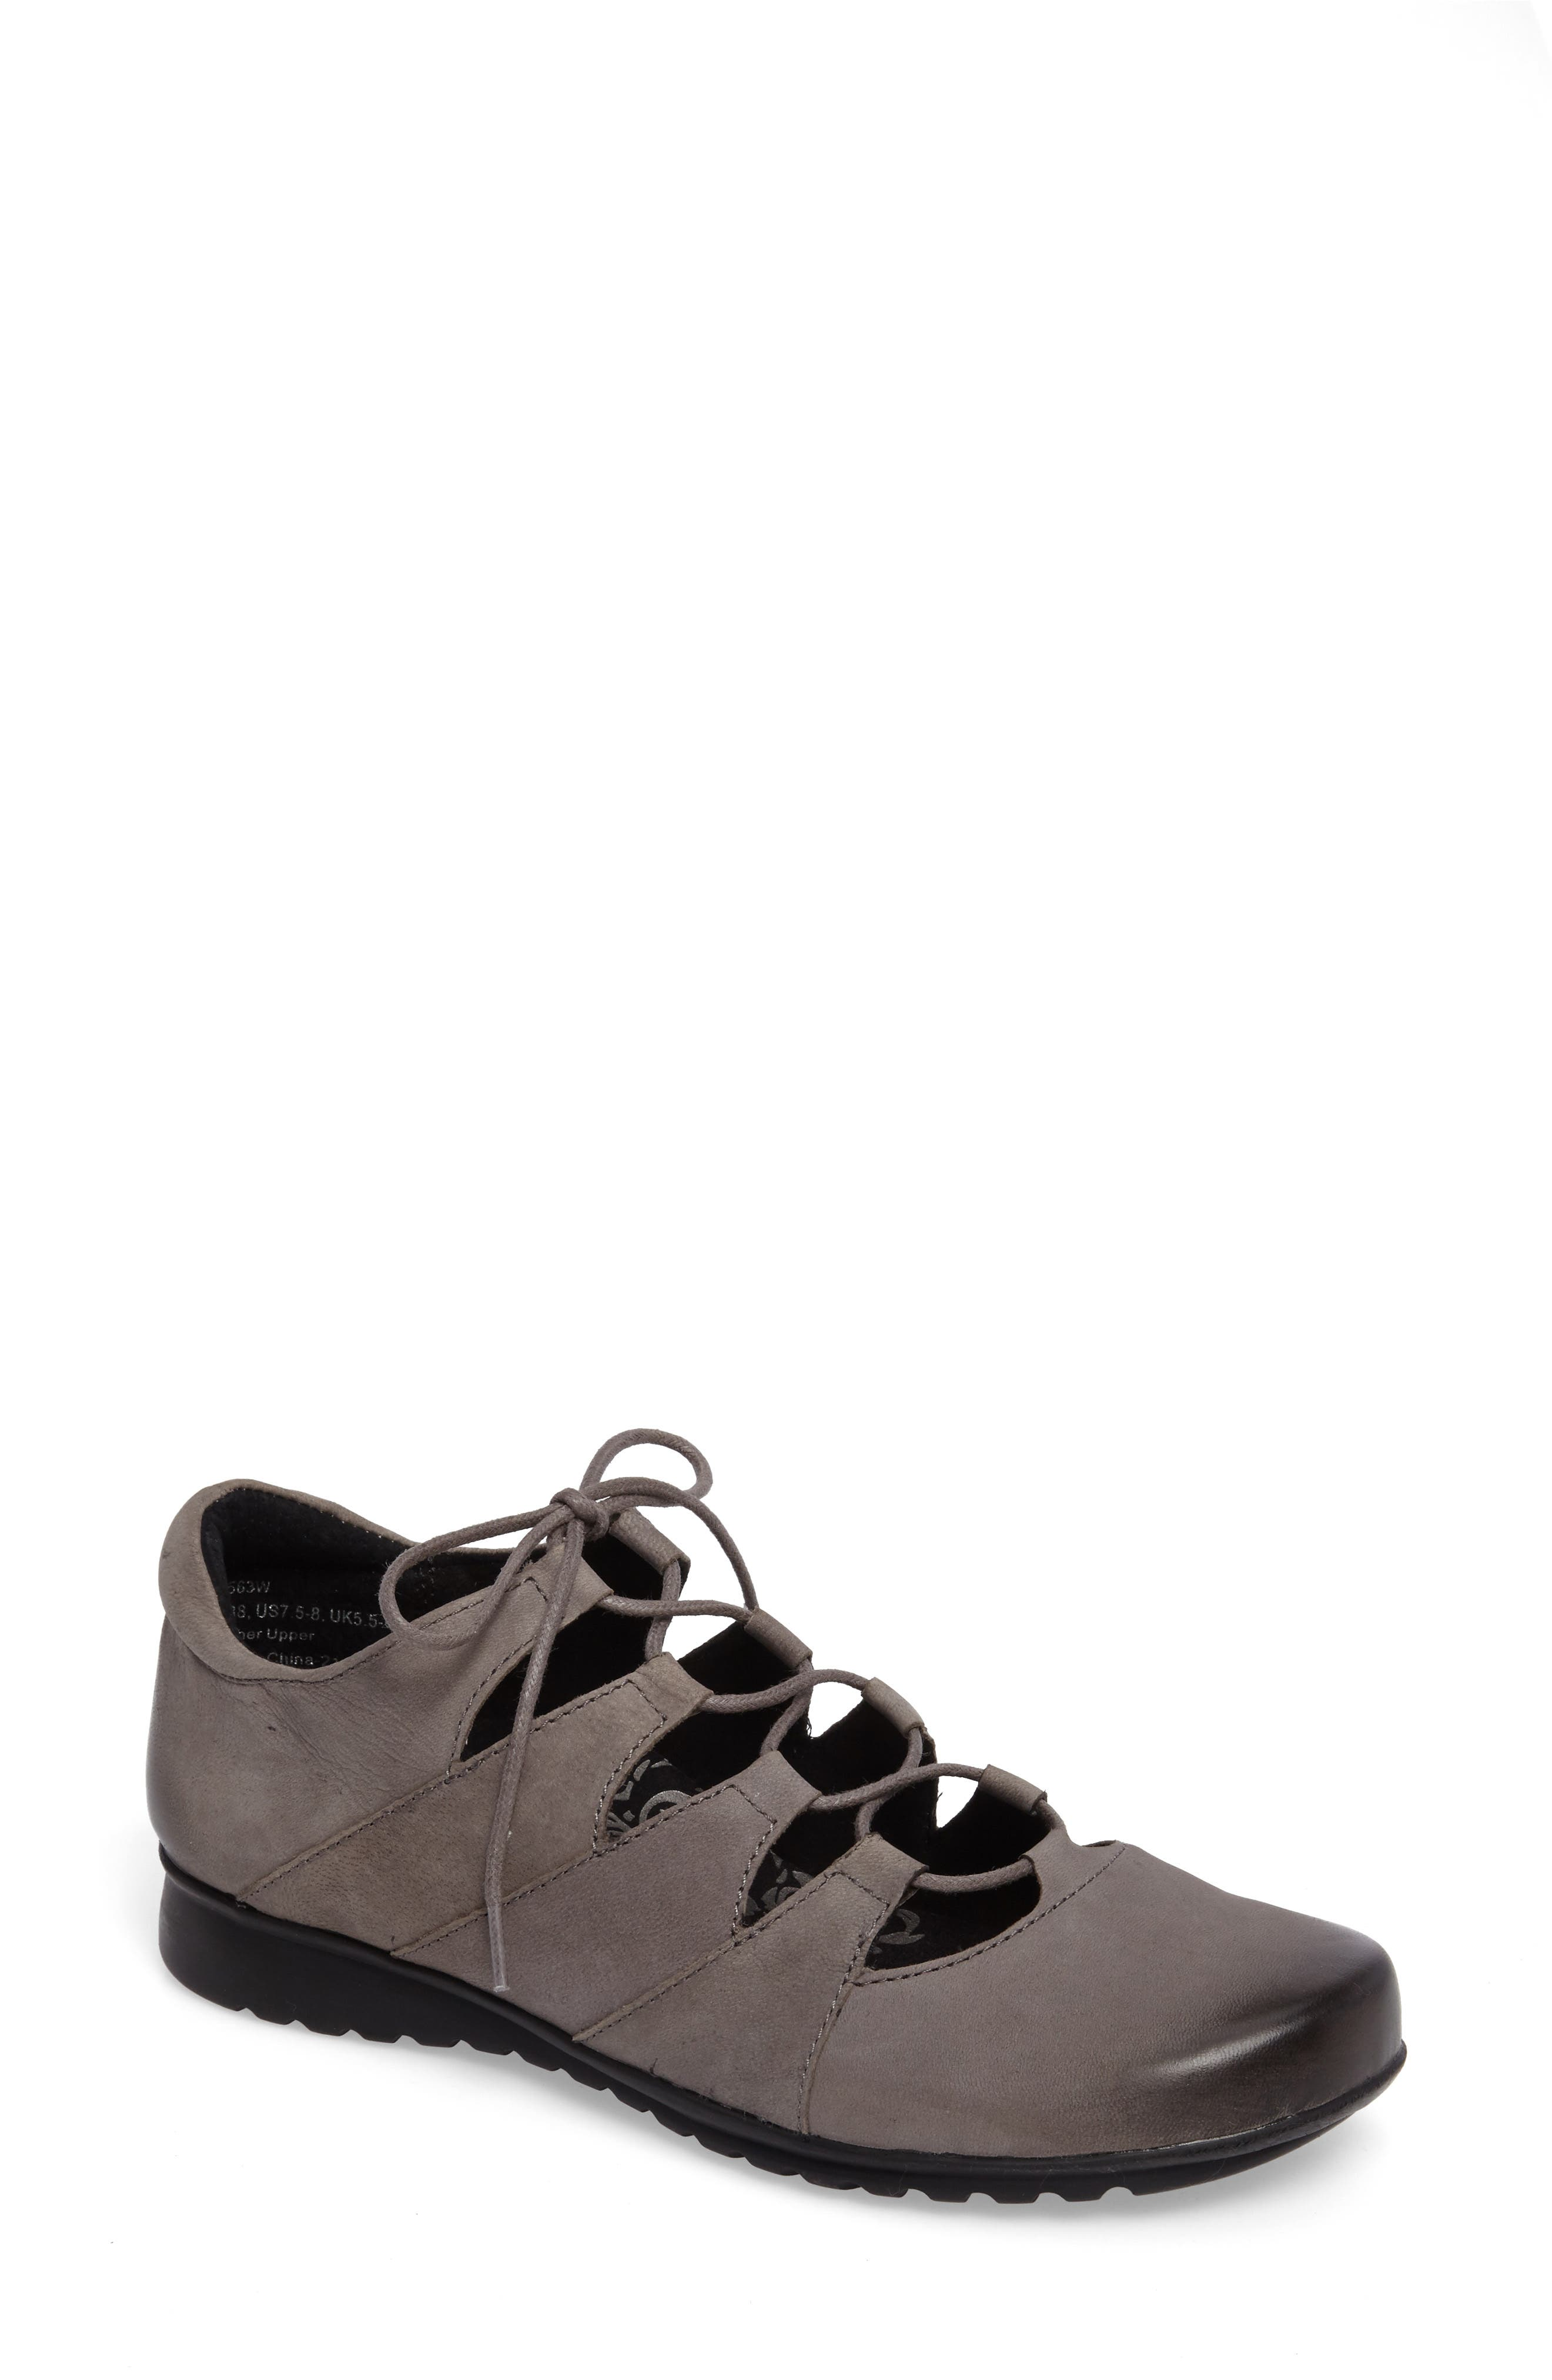 Aetrex Sienna Cutout Sneaker (Women)